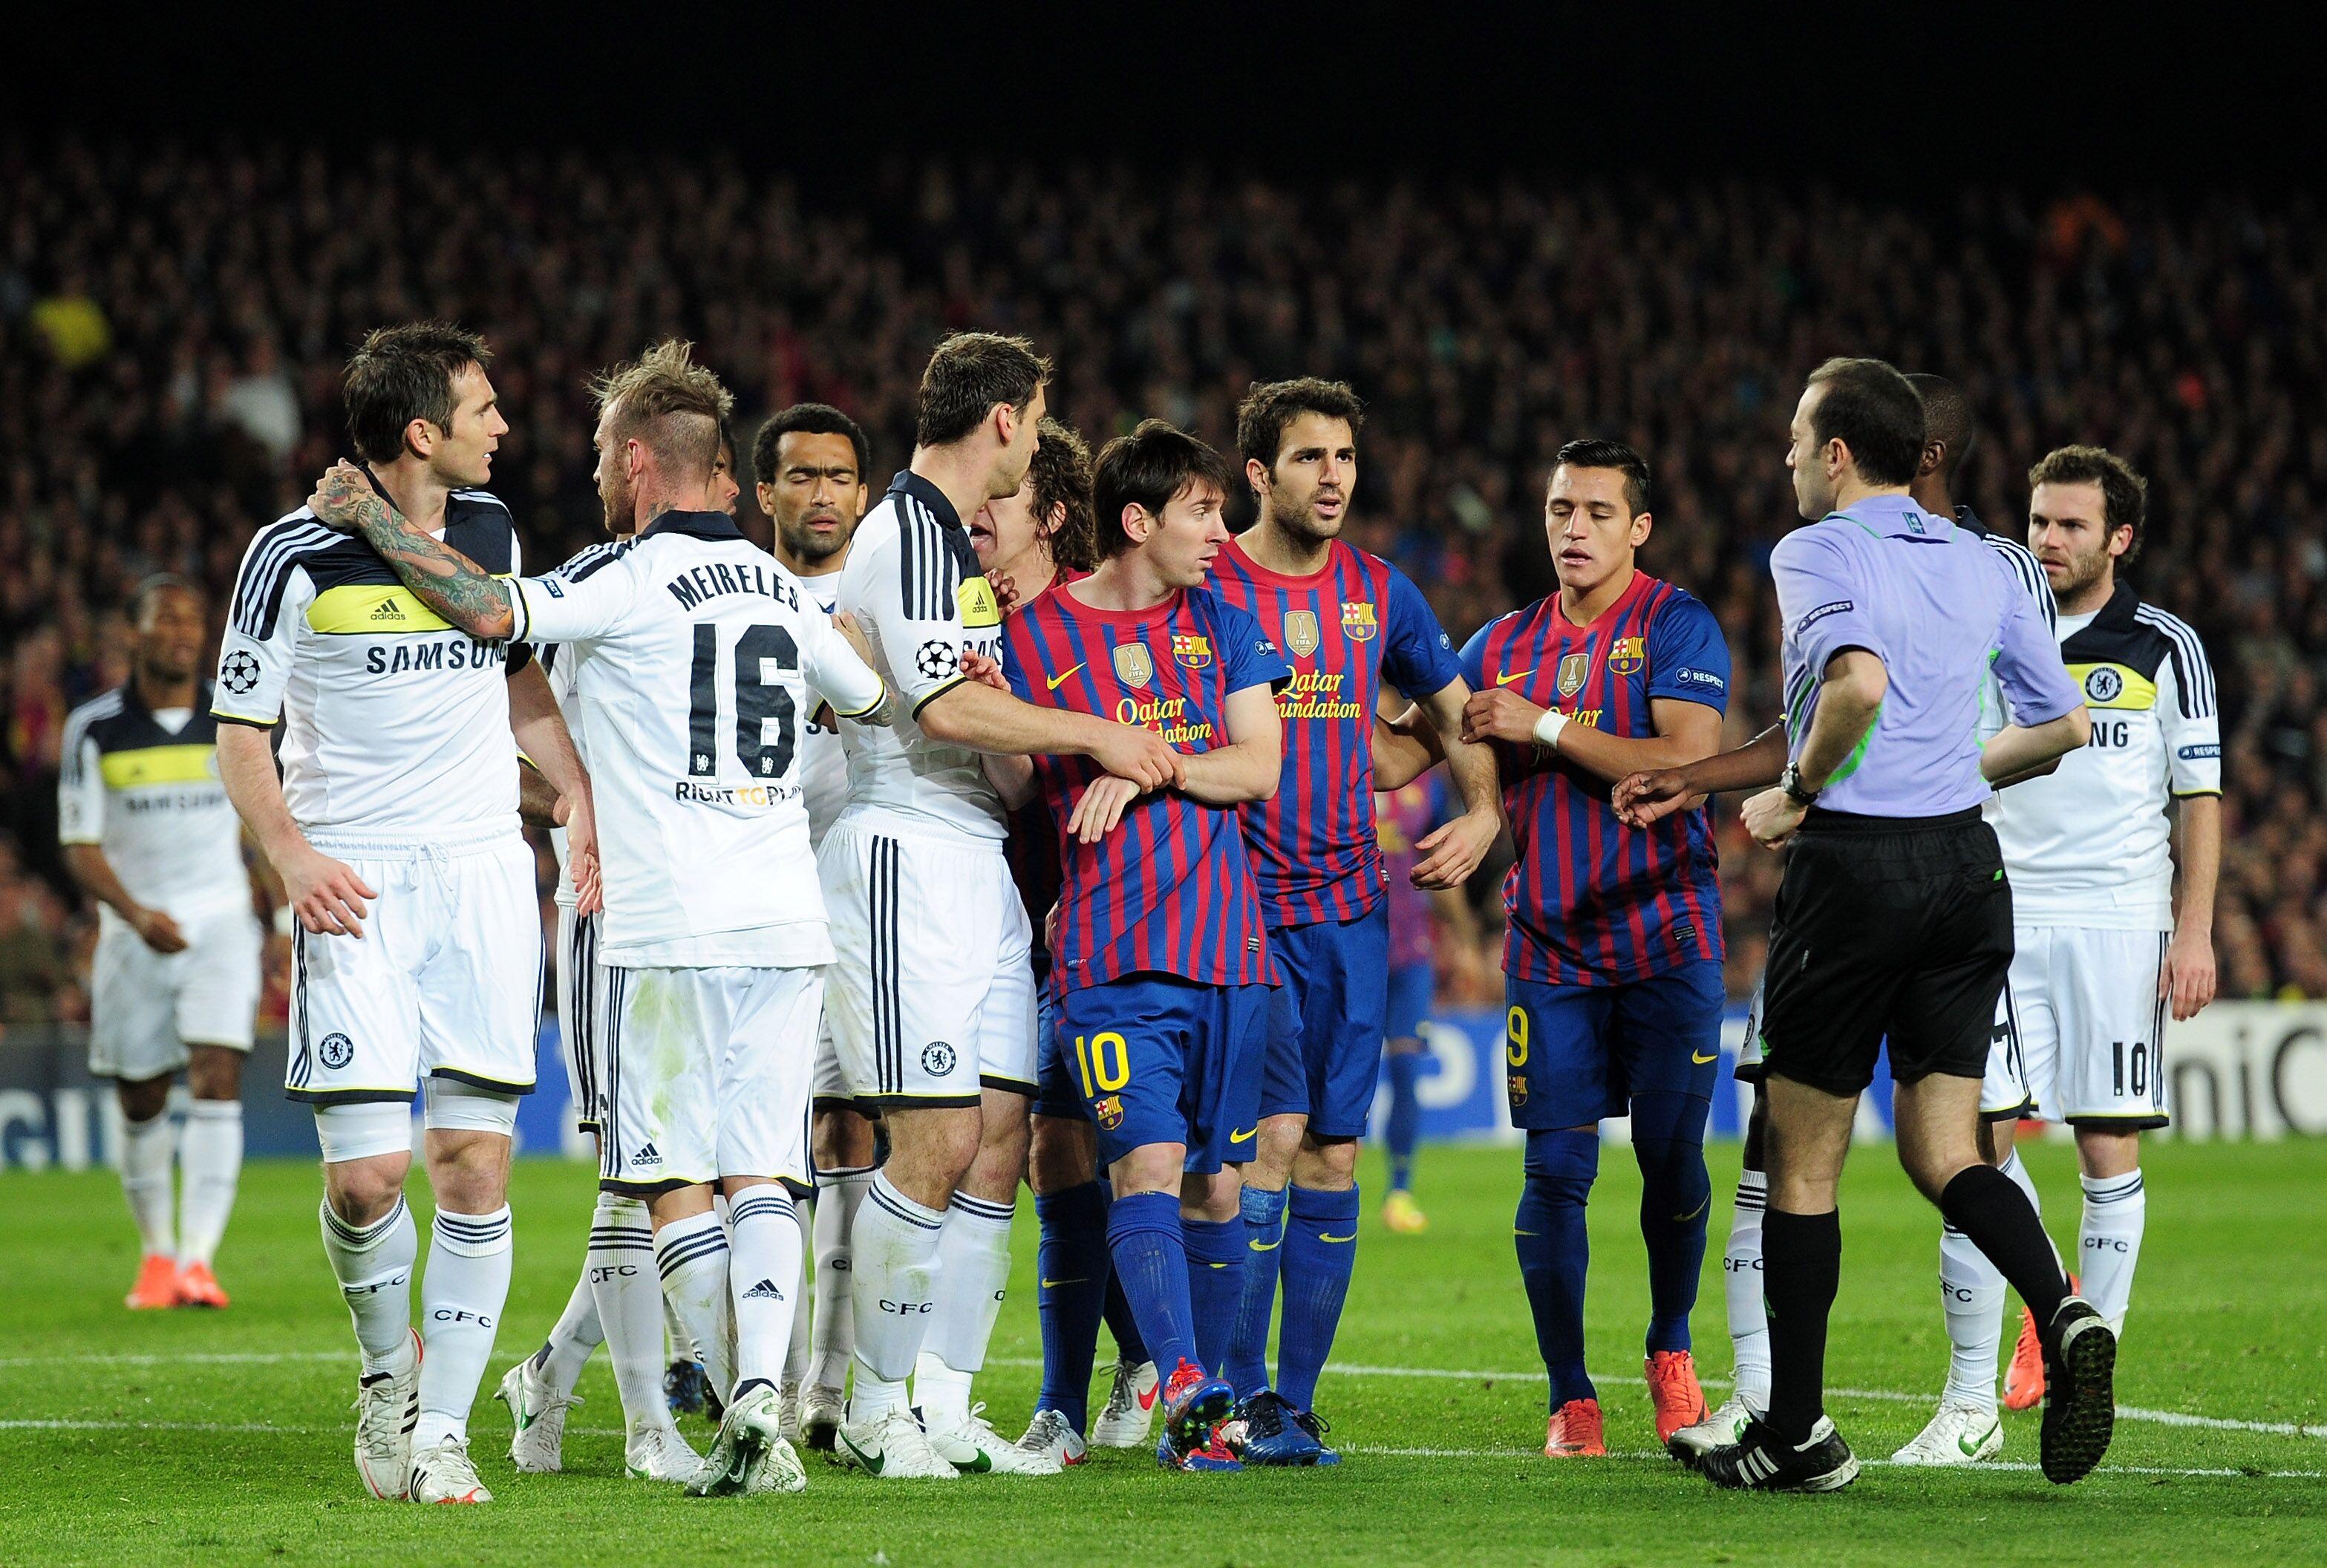 UCL: Chelsea cautiously invites Barcelona to Stamford Bridge